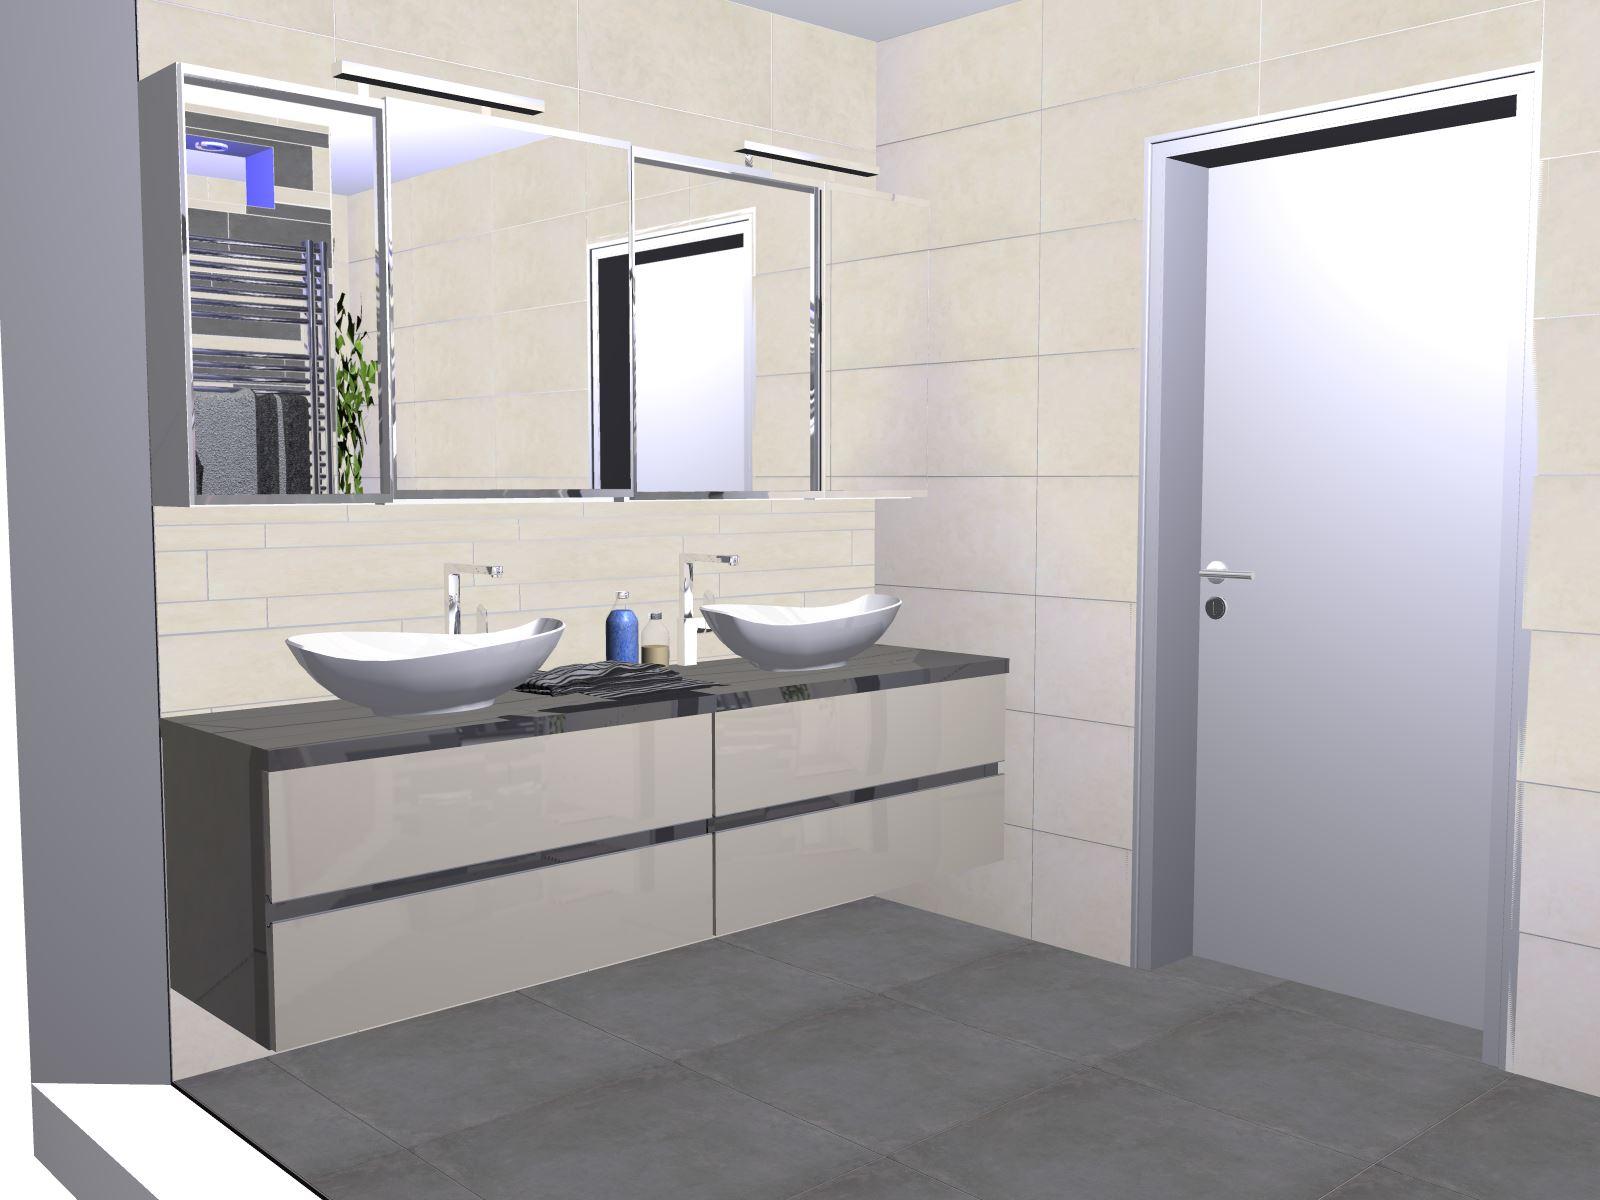 abk docks bathroom by pirman romana trgocev d o o on. Black Bedroom Furniture Sets. Home Design Ideas